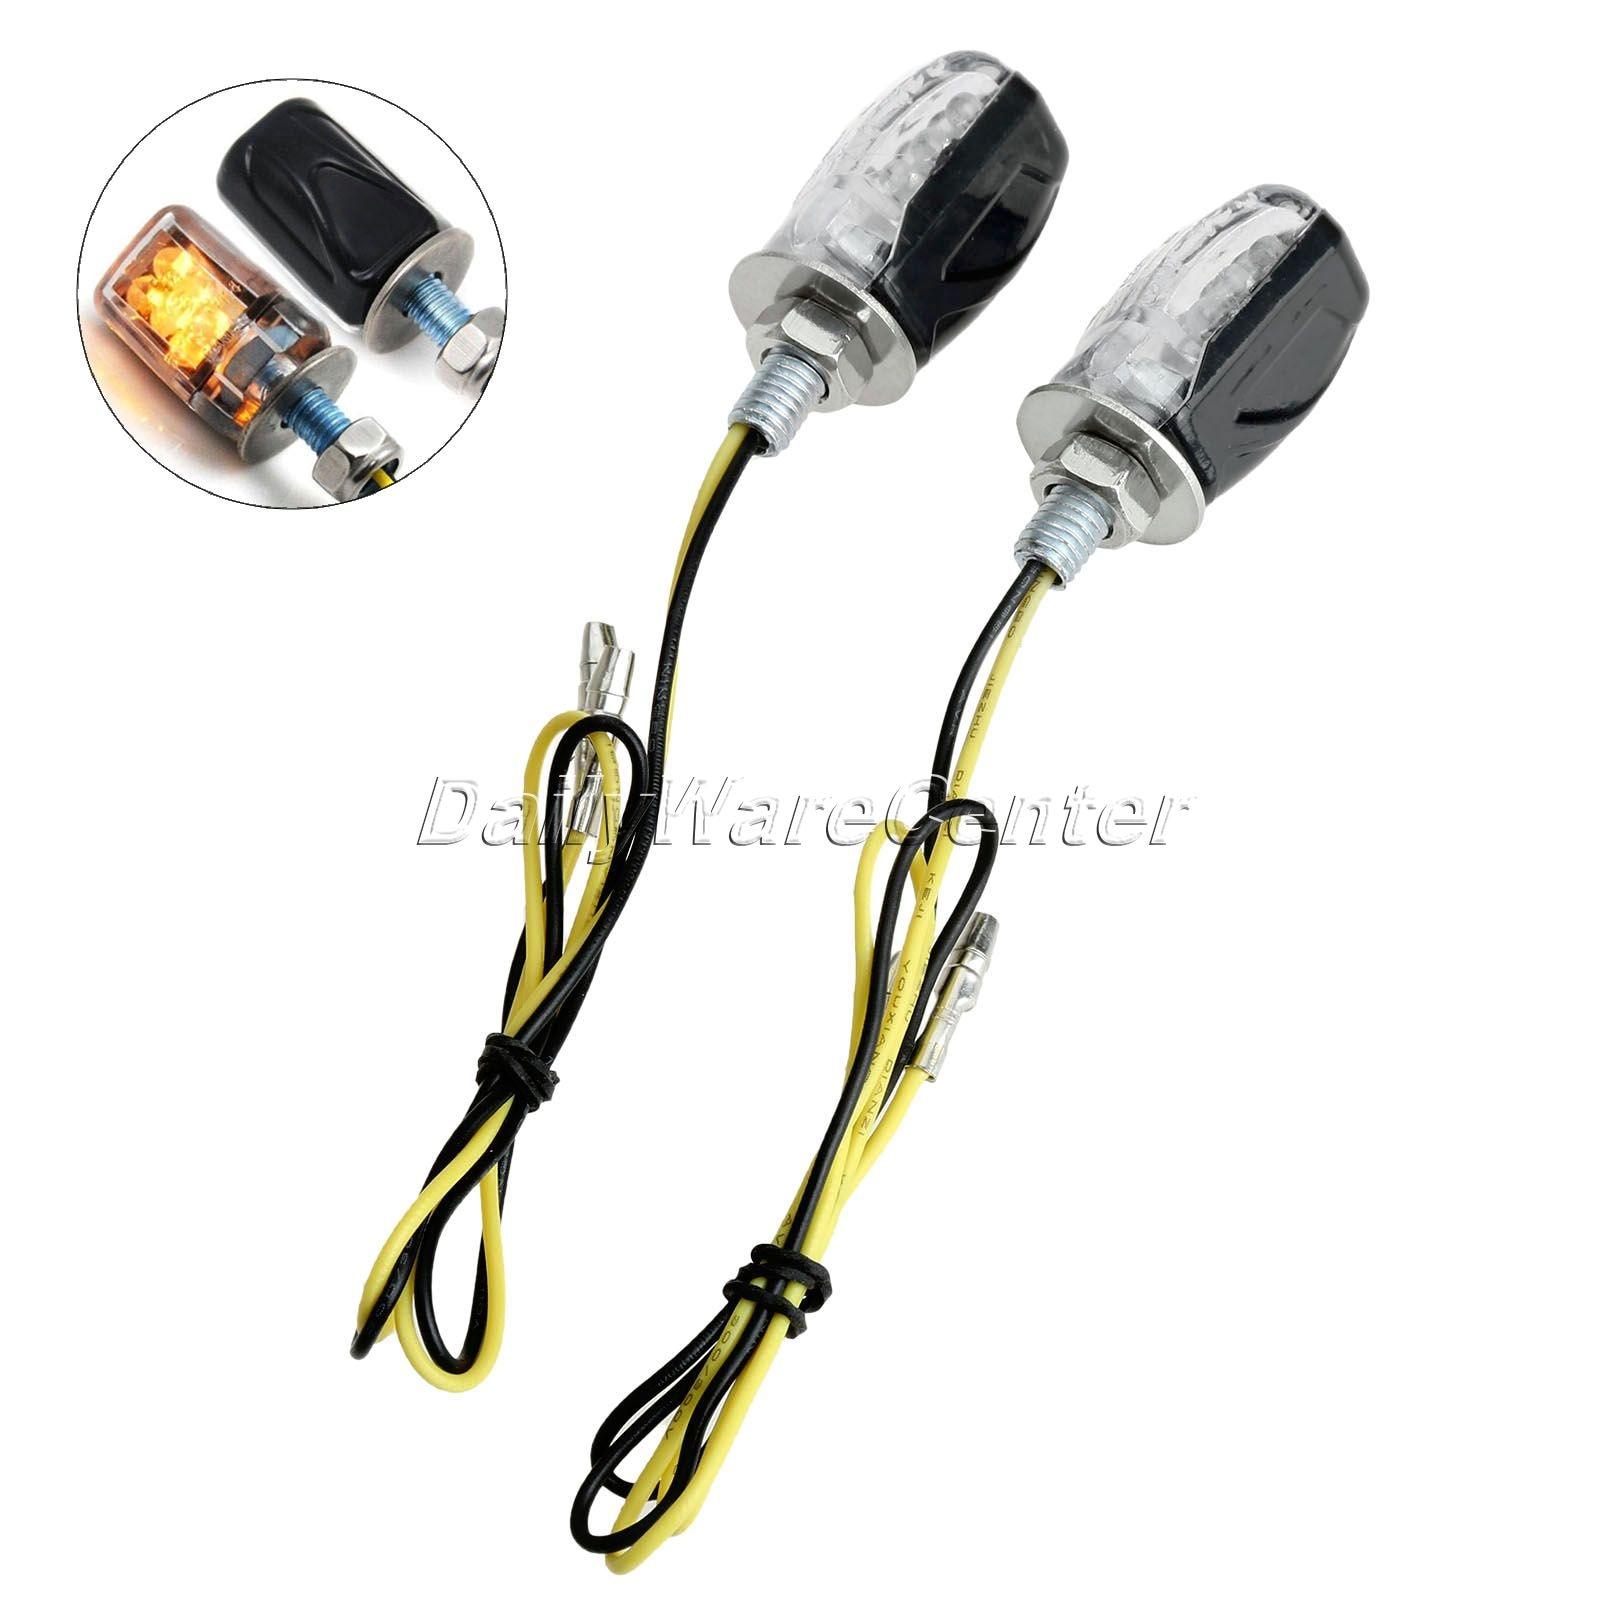 все цены на 2x Motorcycle Led Turn Signal Indicator Light Lamp 6 LED Amber Light Universal Blinker Flashers For Honda Kawasaki Suzuki Yamaha онлайн